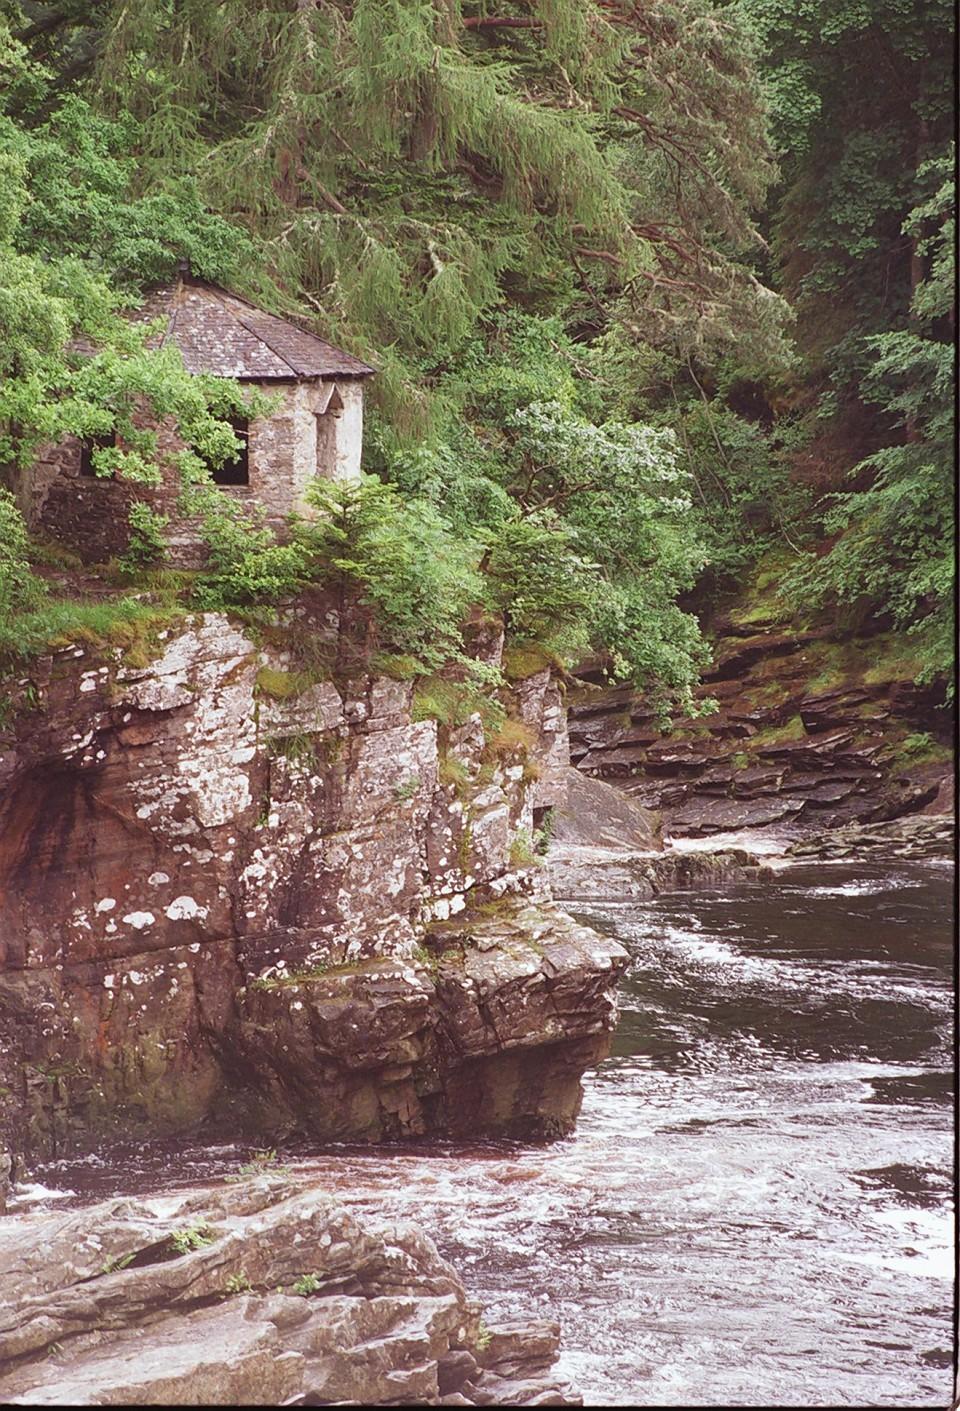 The River Moriston